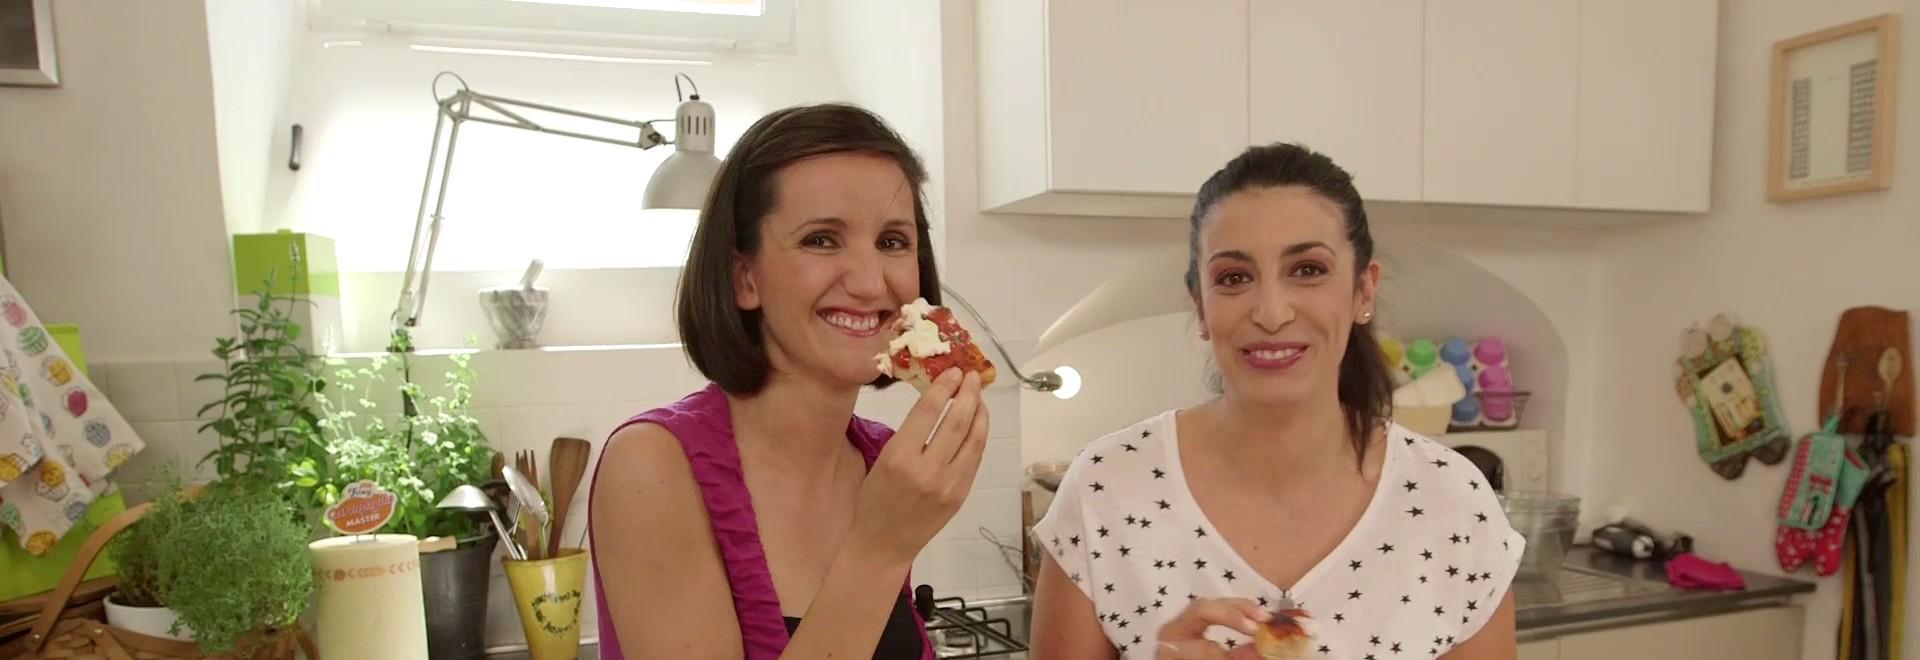 La cucina delle ragazze